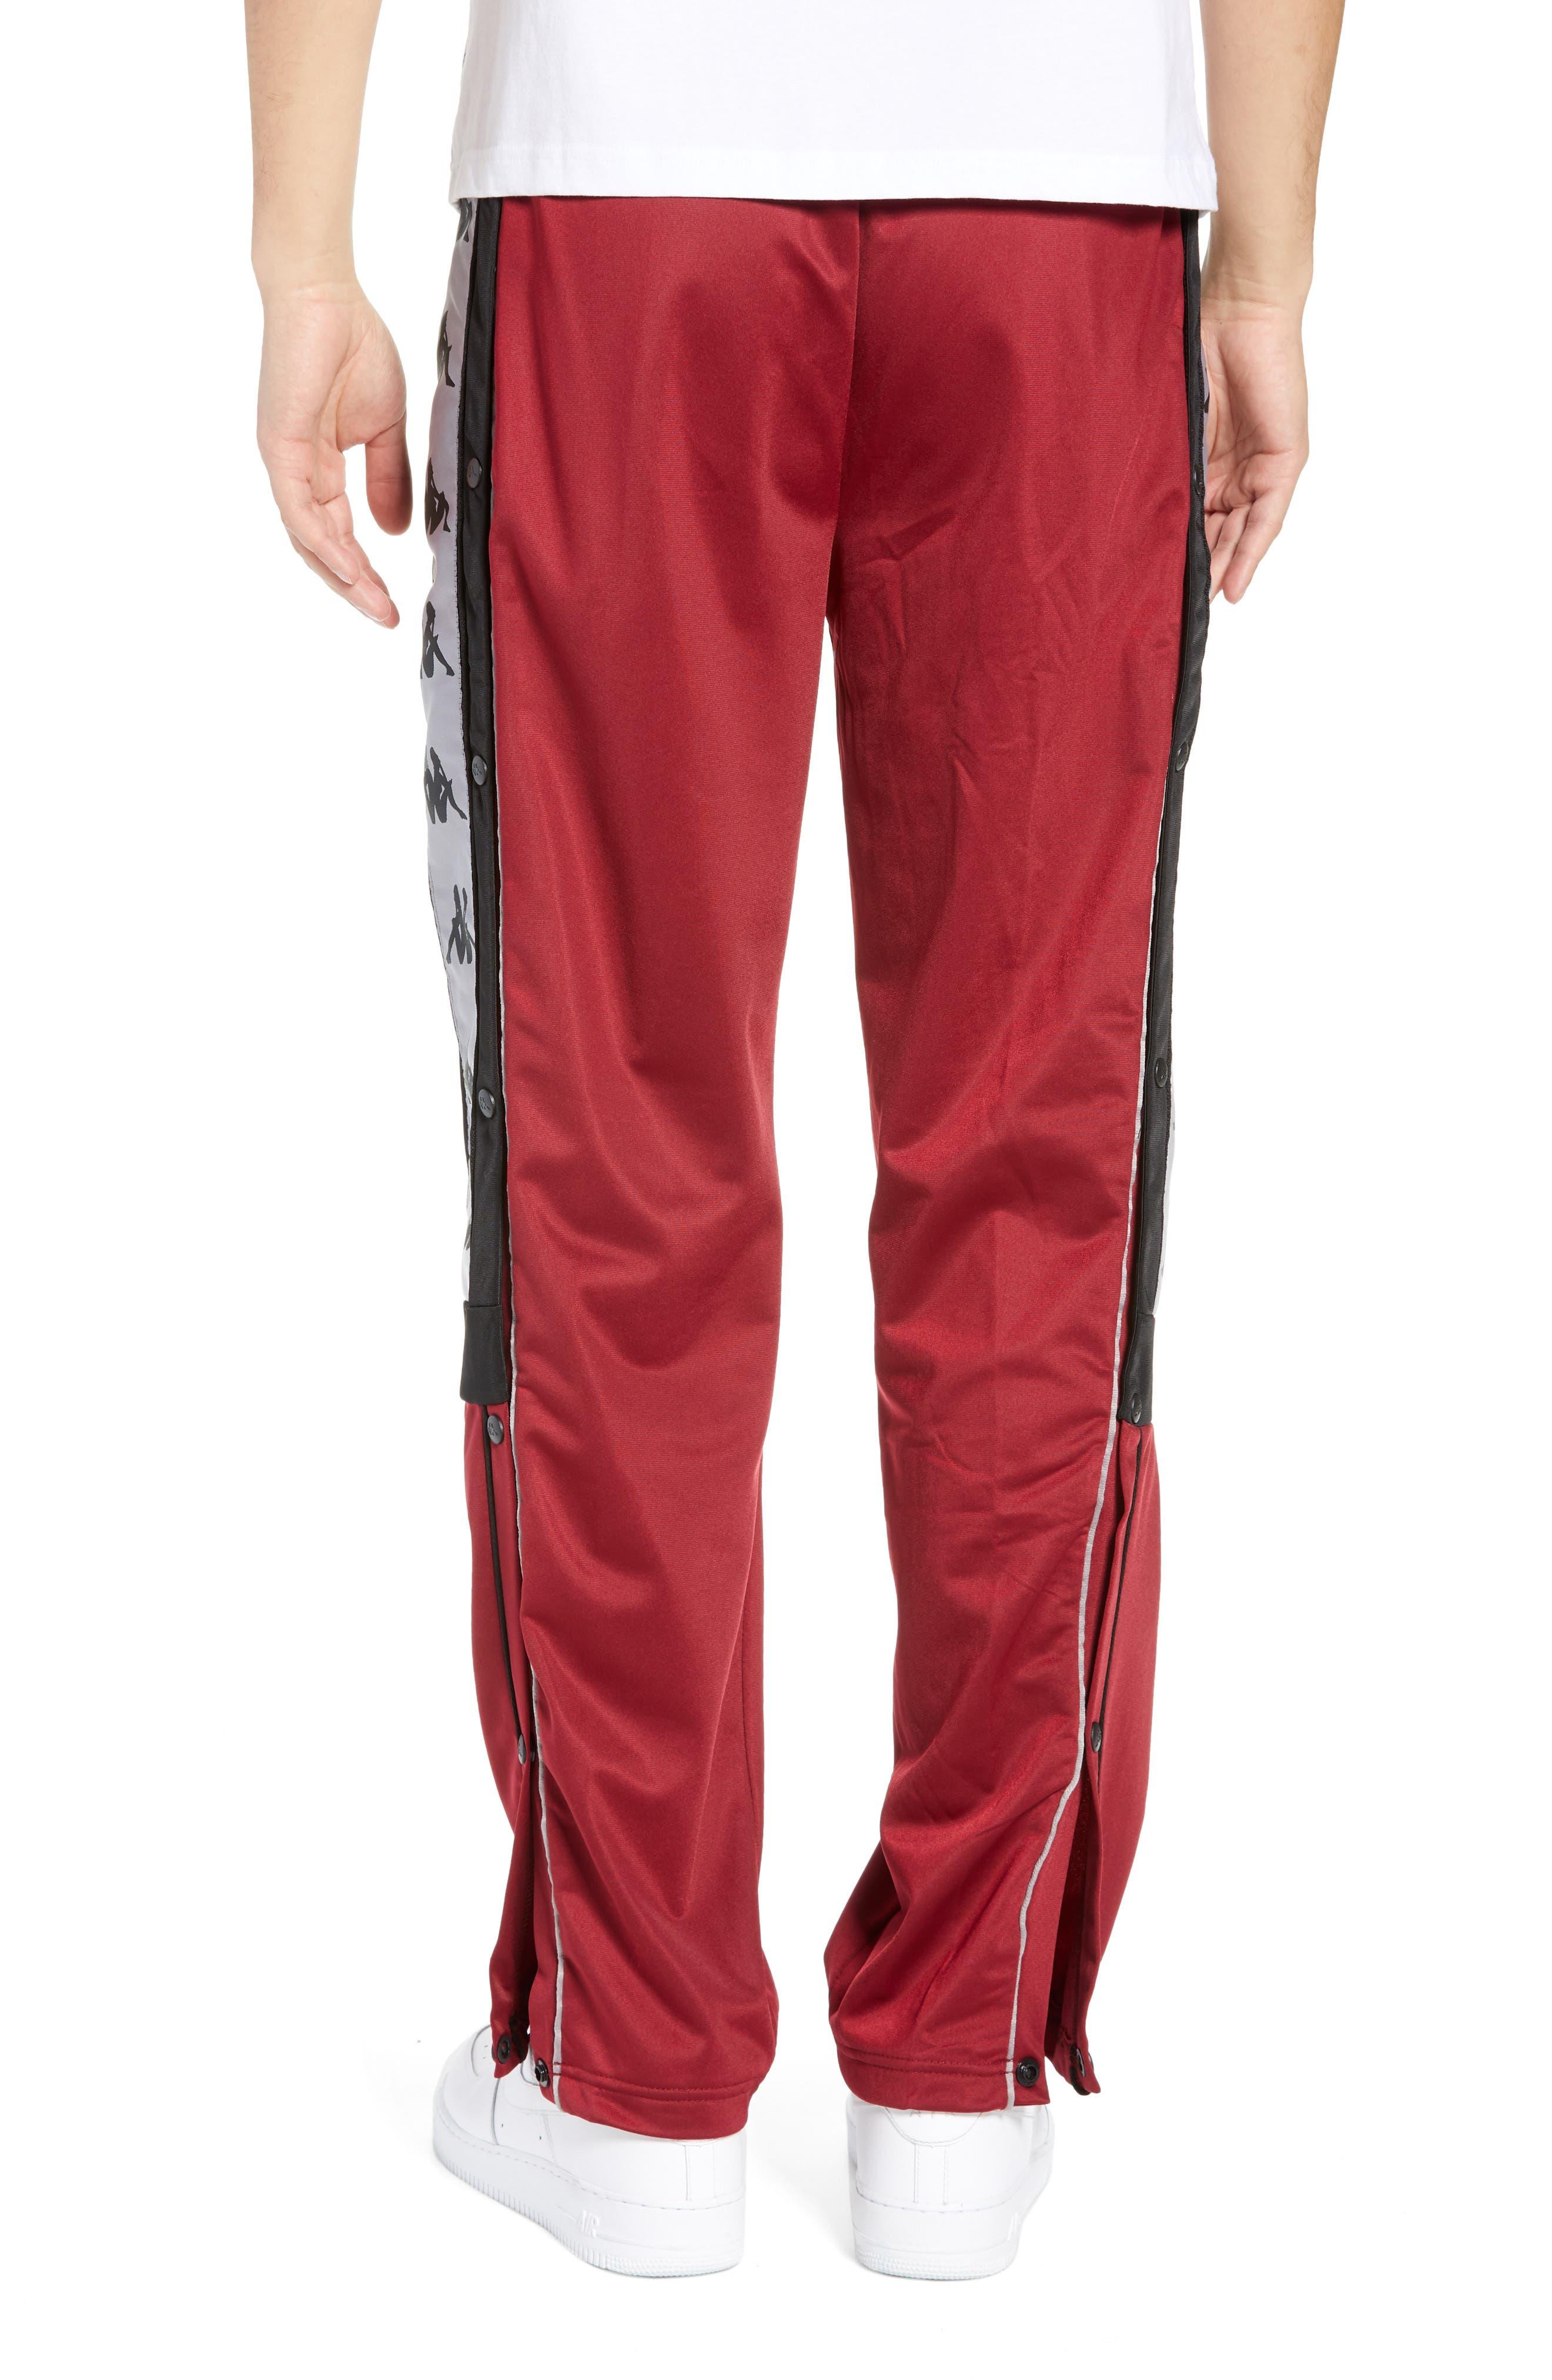 Active 222 Banda Snap-Away Warm-Up Pants,                             Alternate thumbnail 2, color,                             RED BORDEAUX BLACK